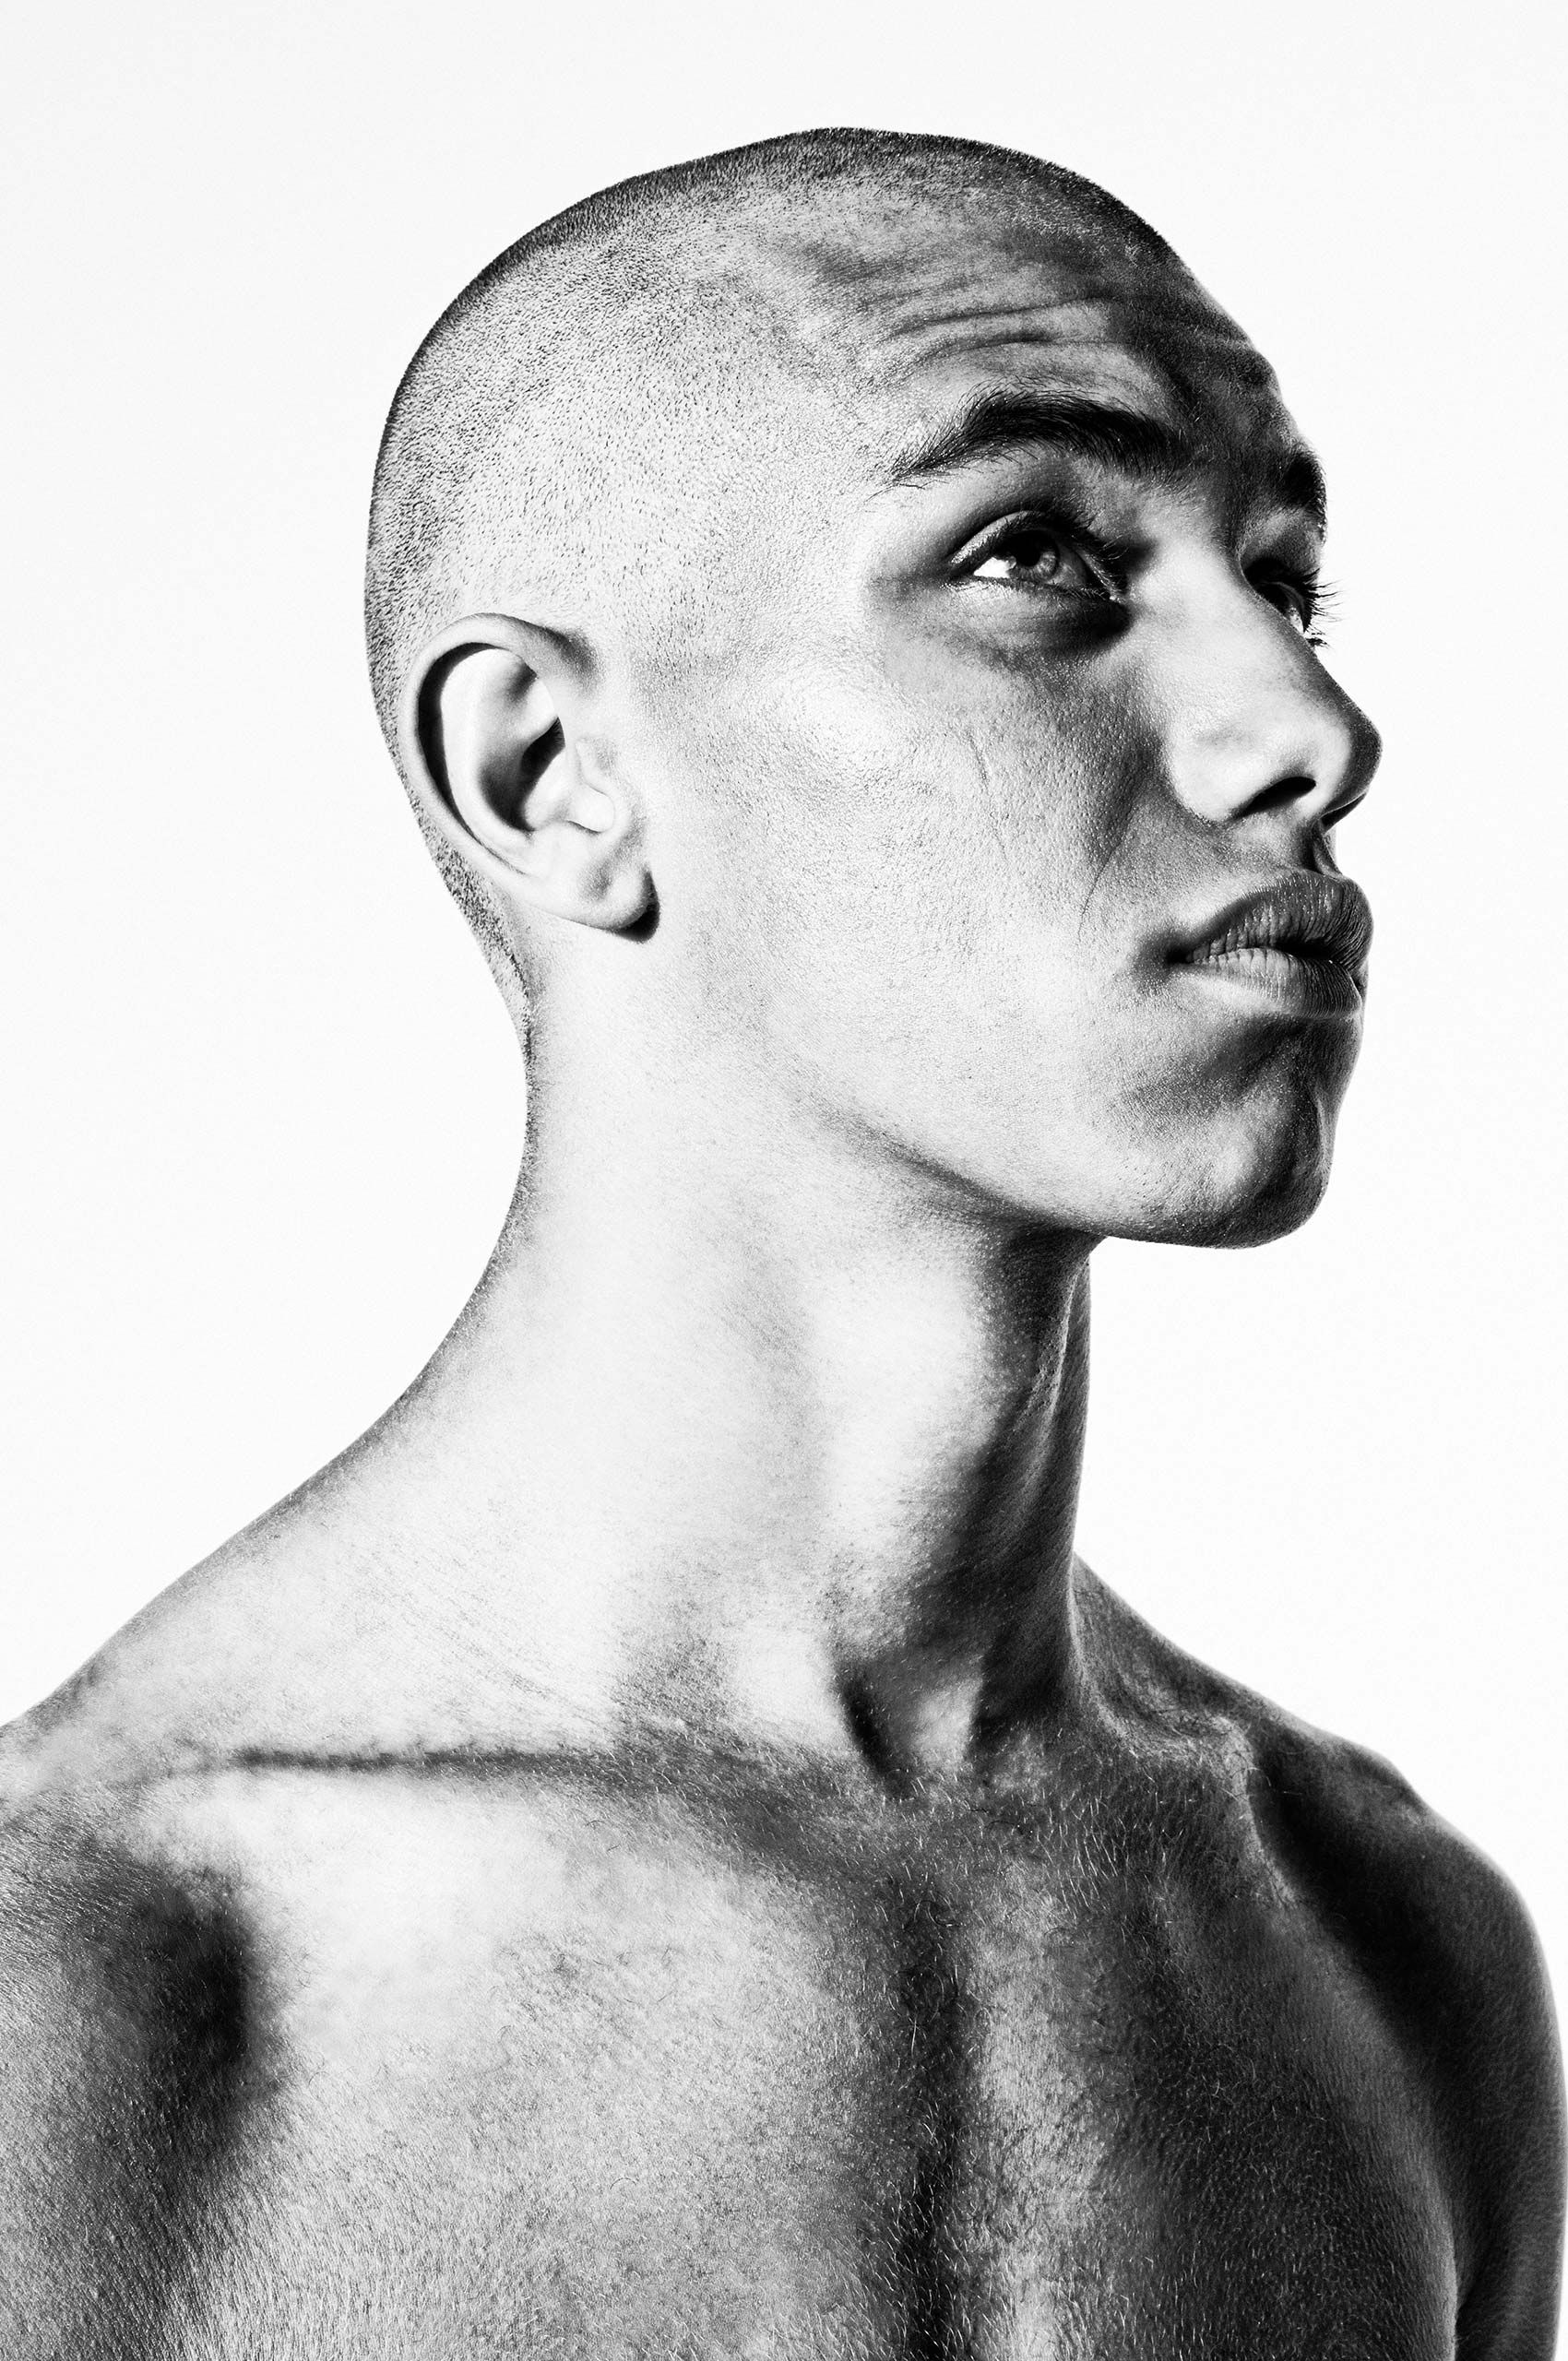 young-male-HenrikOlundPhotography..jpg